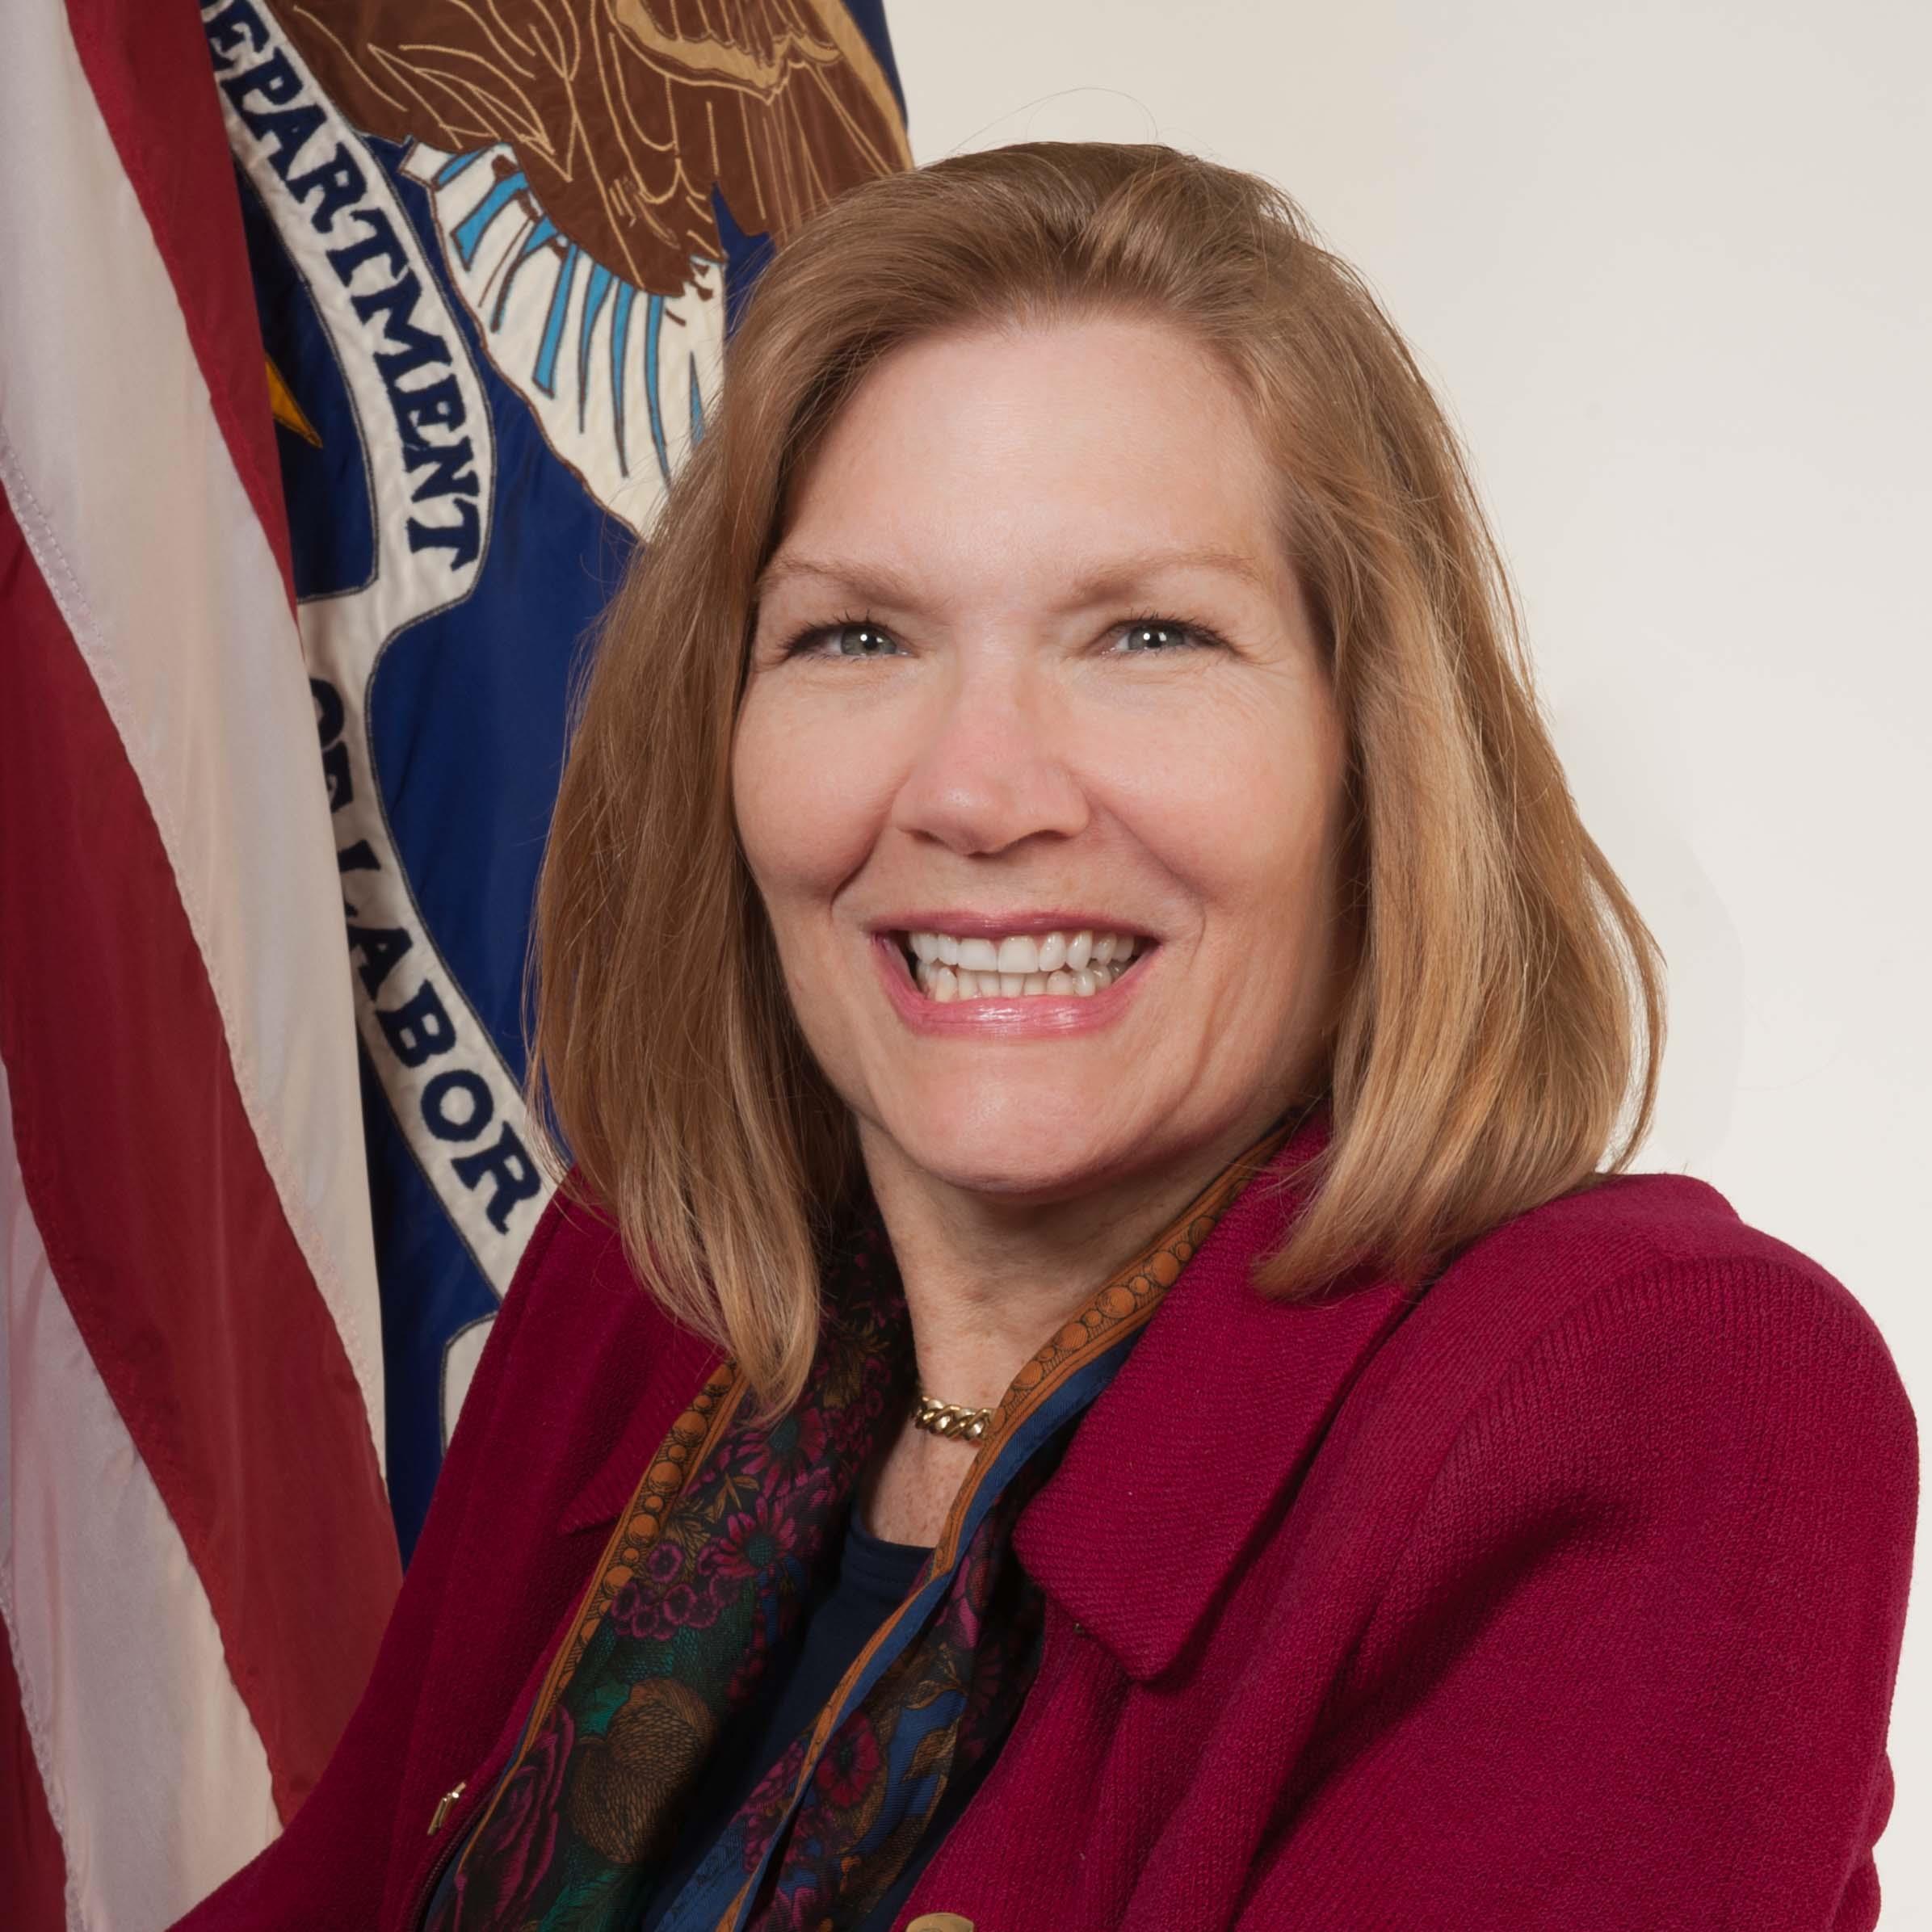 DAS Jennifer Sheehy_Official Portrait.jpg